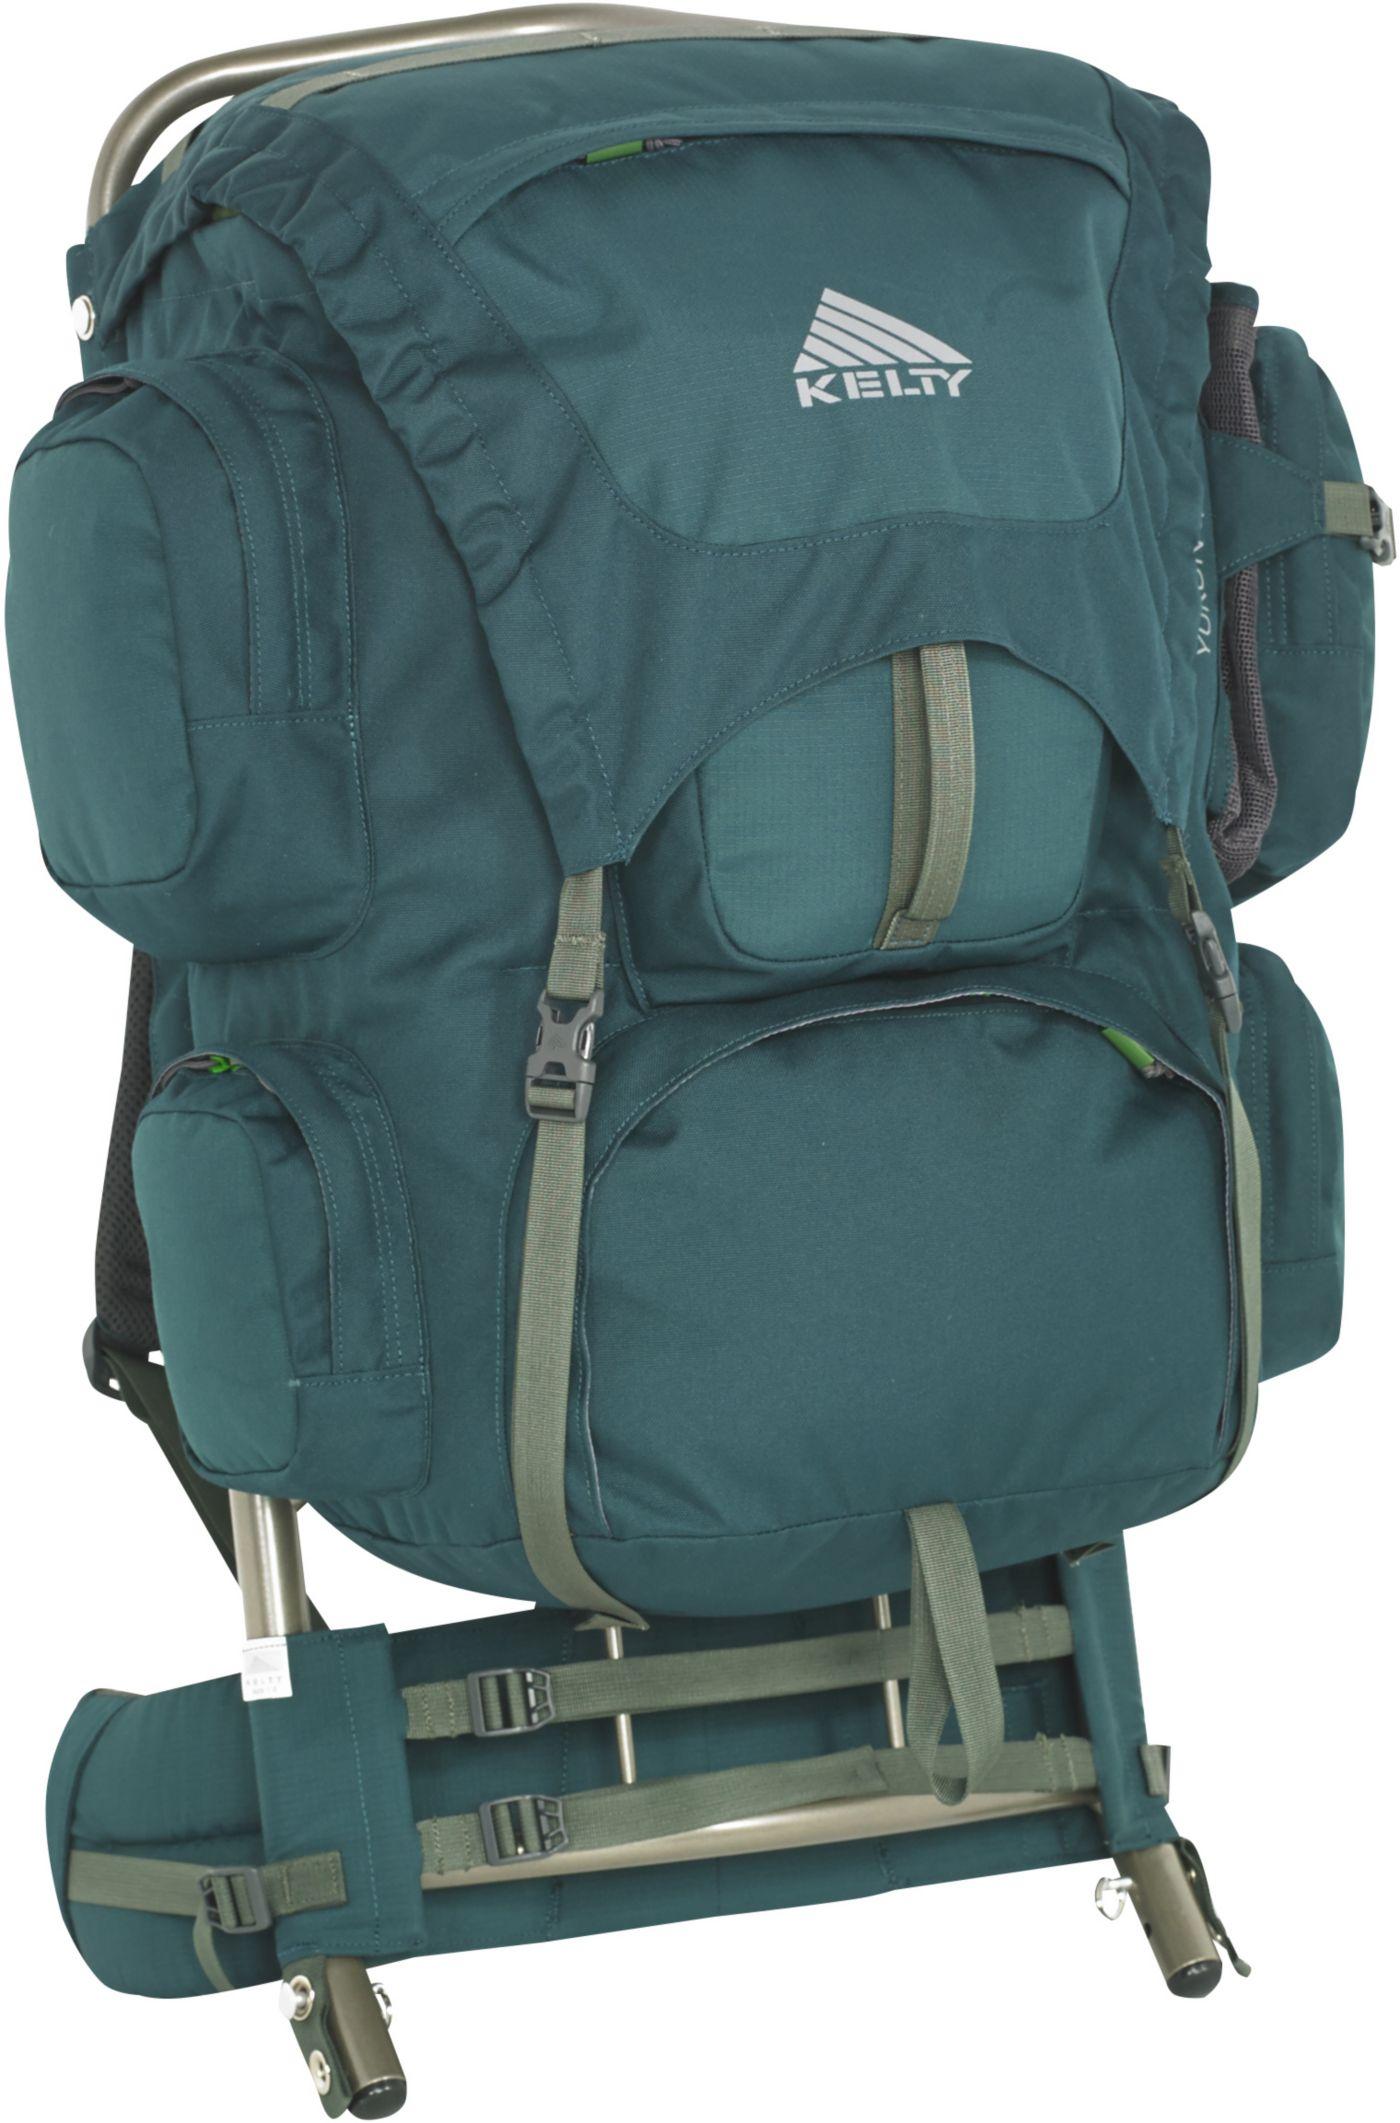 Kelty Yukon 48L External Frame Pack